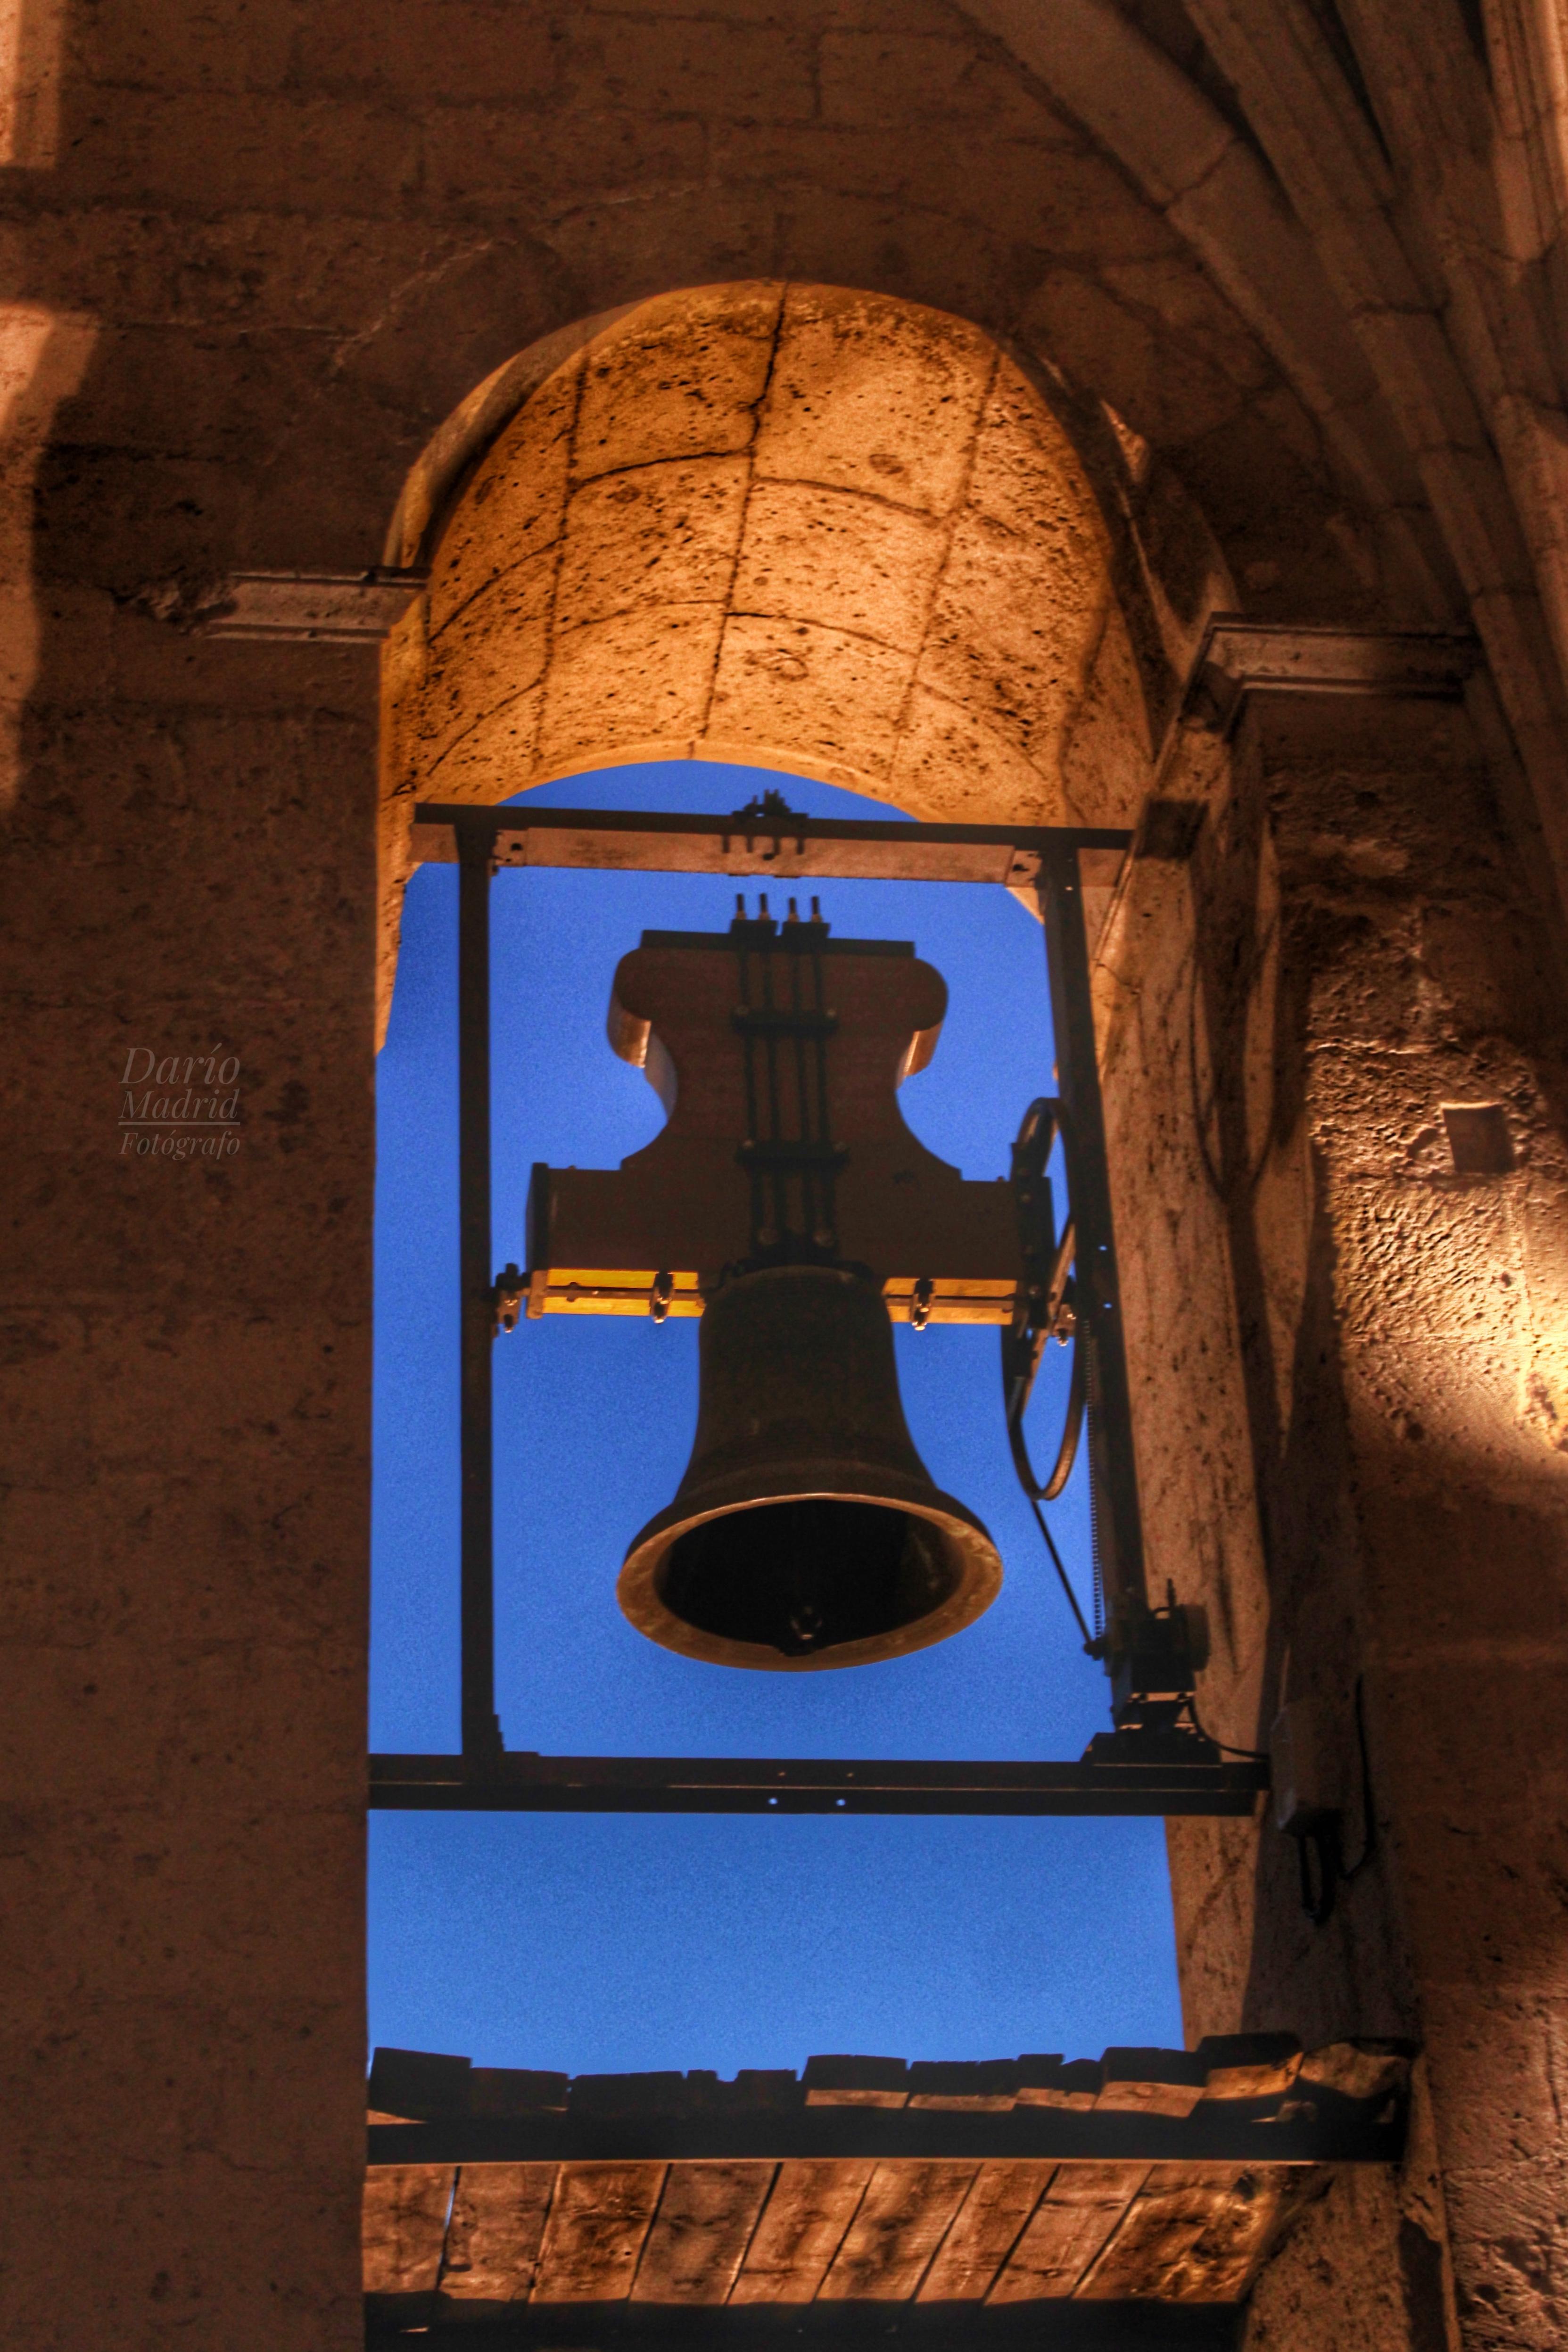 Campana de la Catedral de Segovia